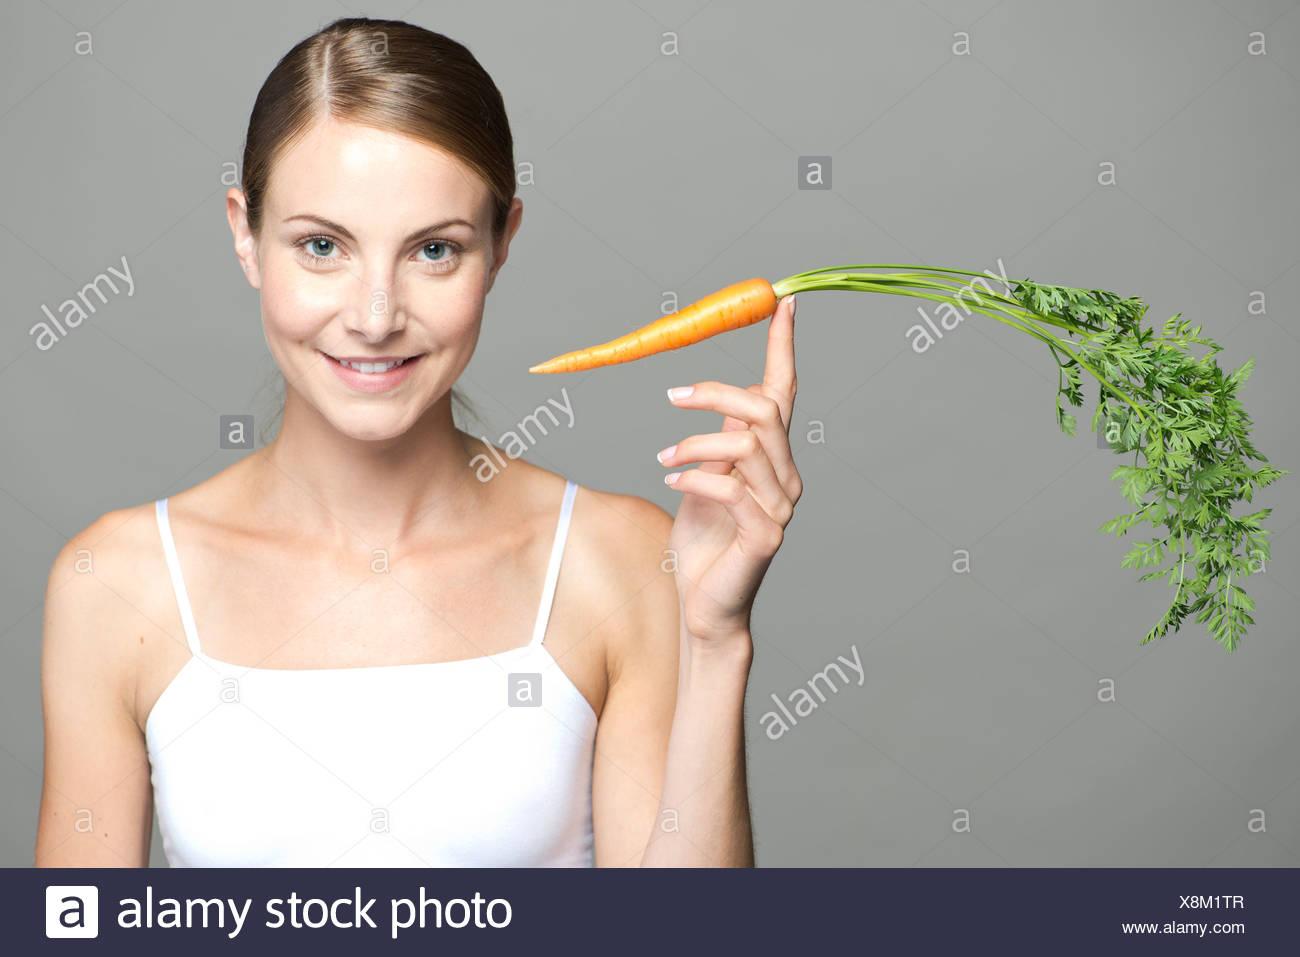 Junge Frau Karotte am Fingerspitze Abwägung Stockbild